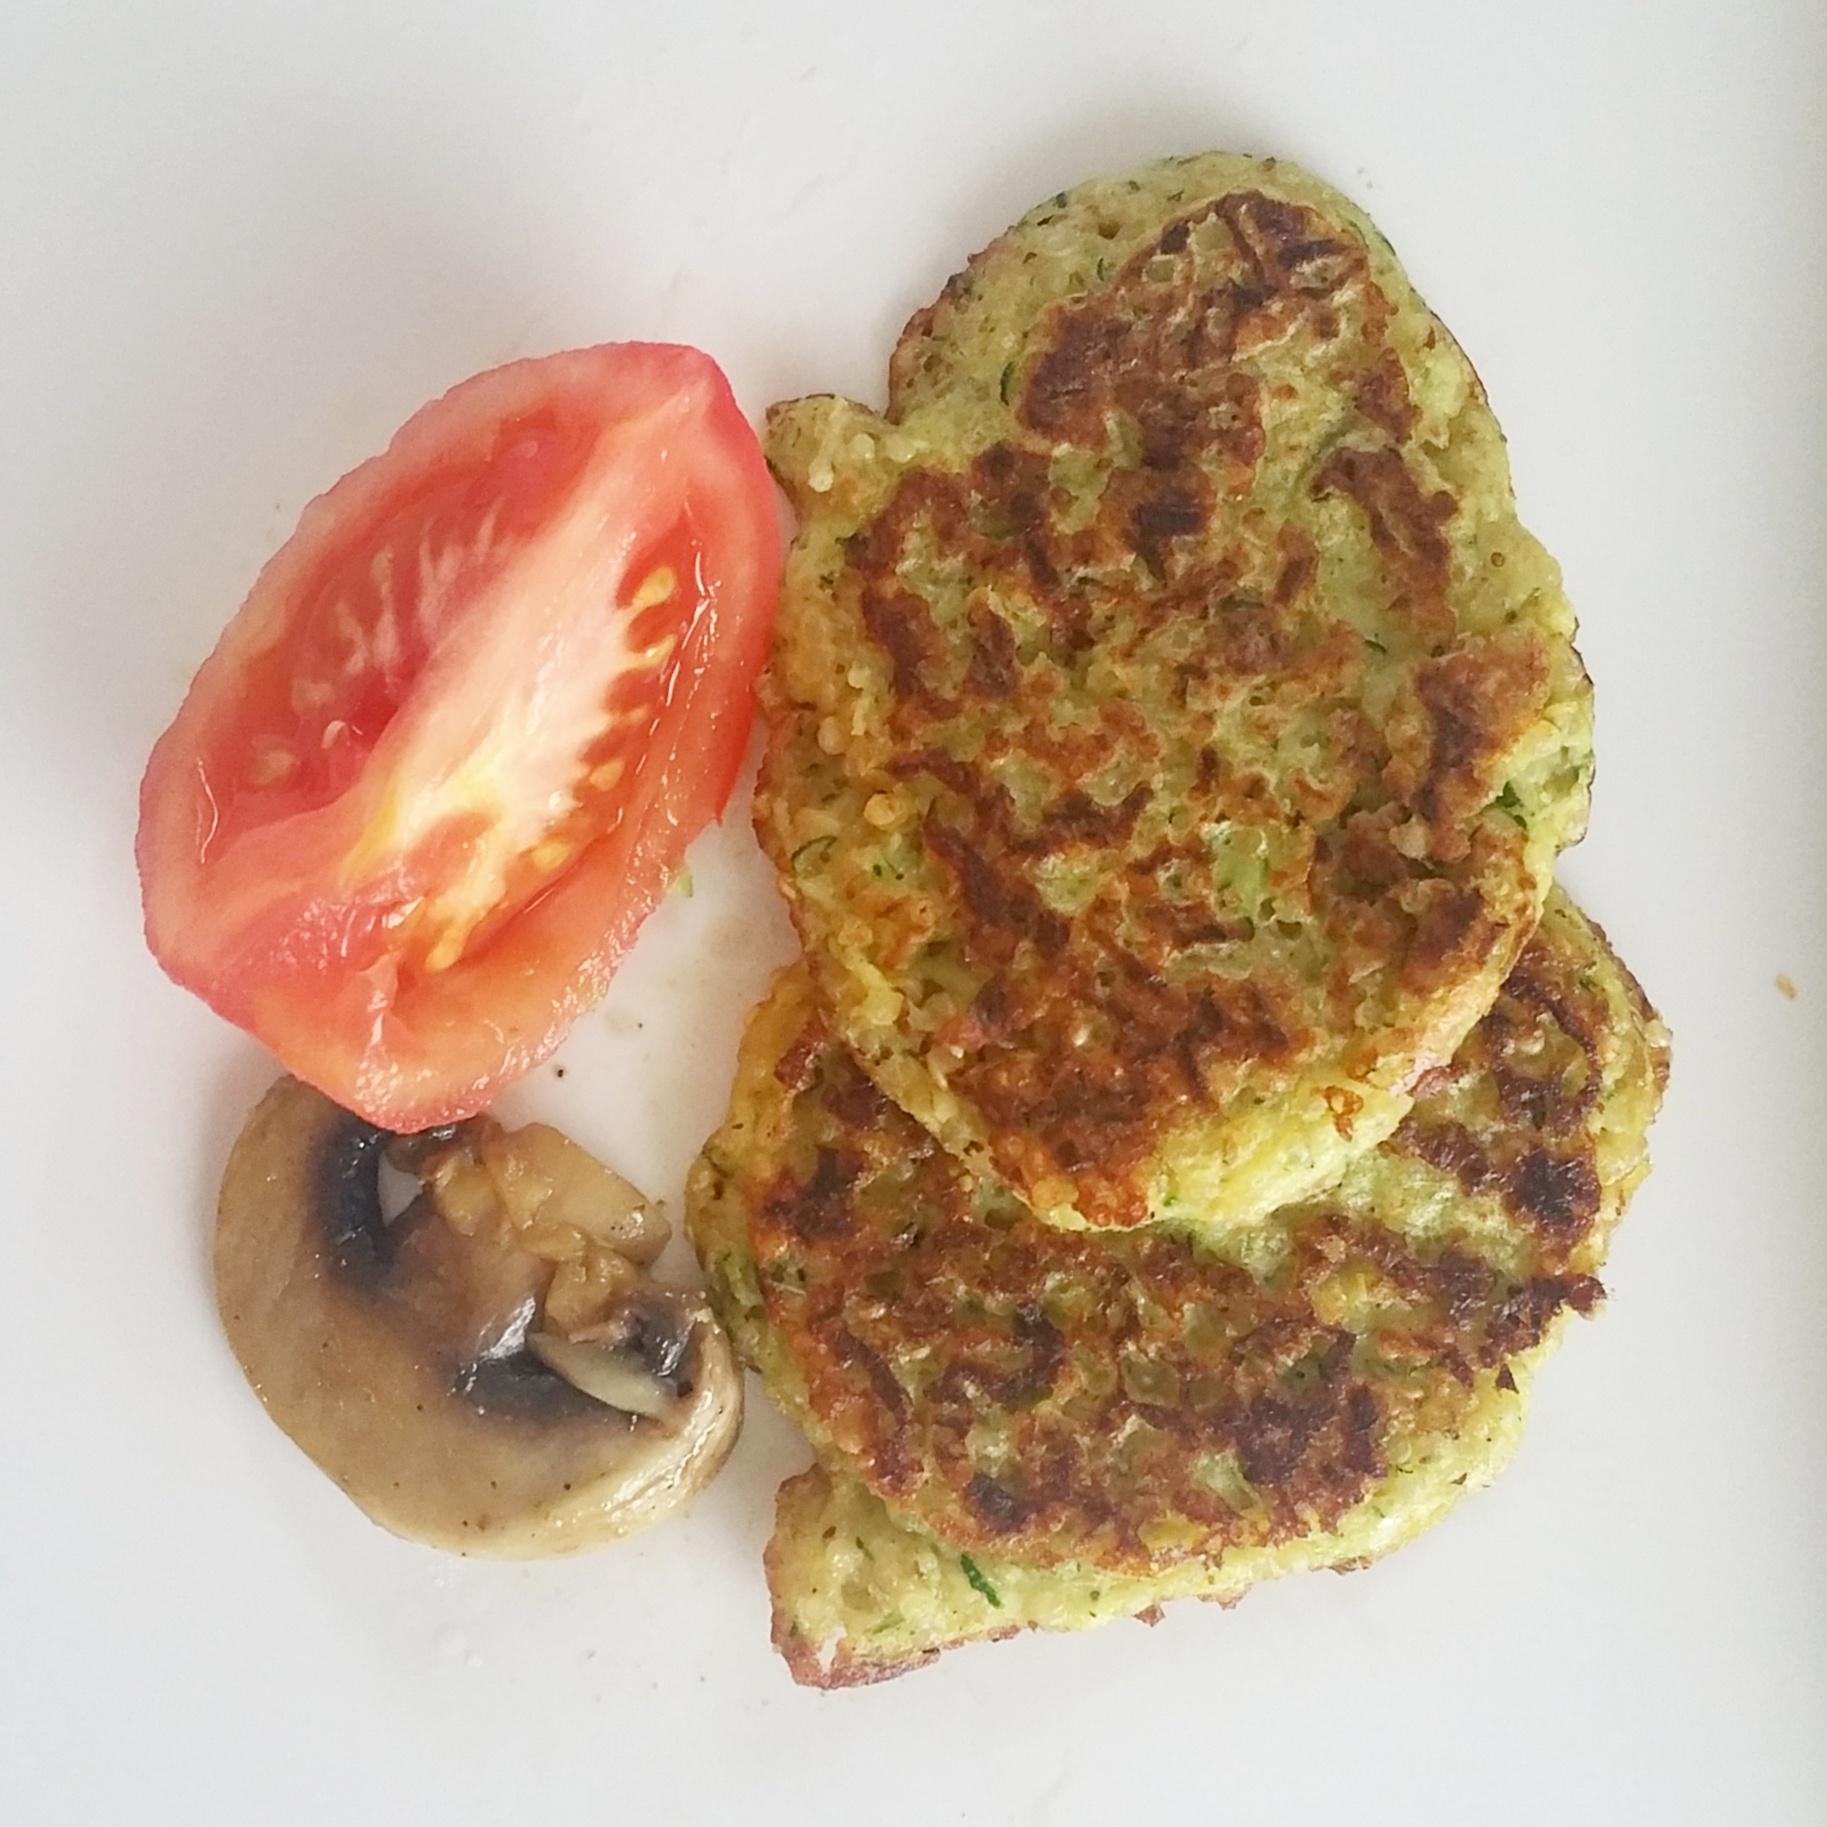 quinoa and chana flower fritters, mushroom, skinned tomato